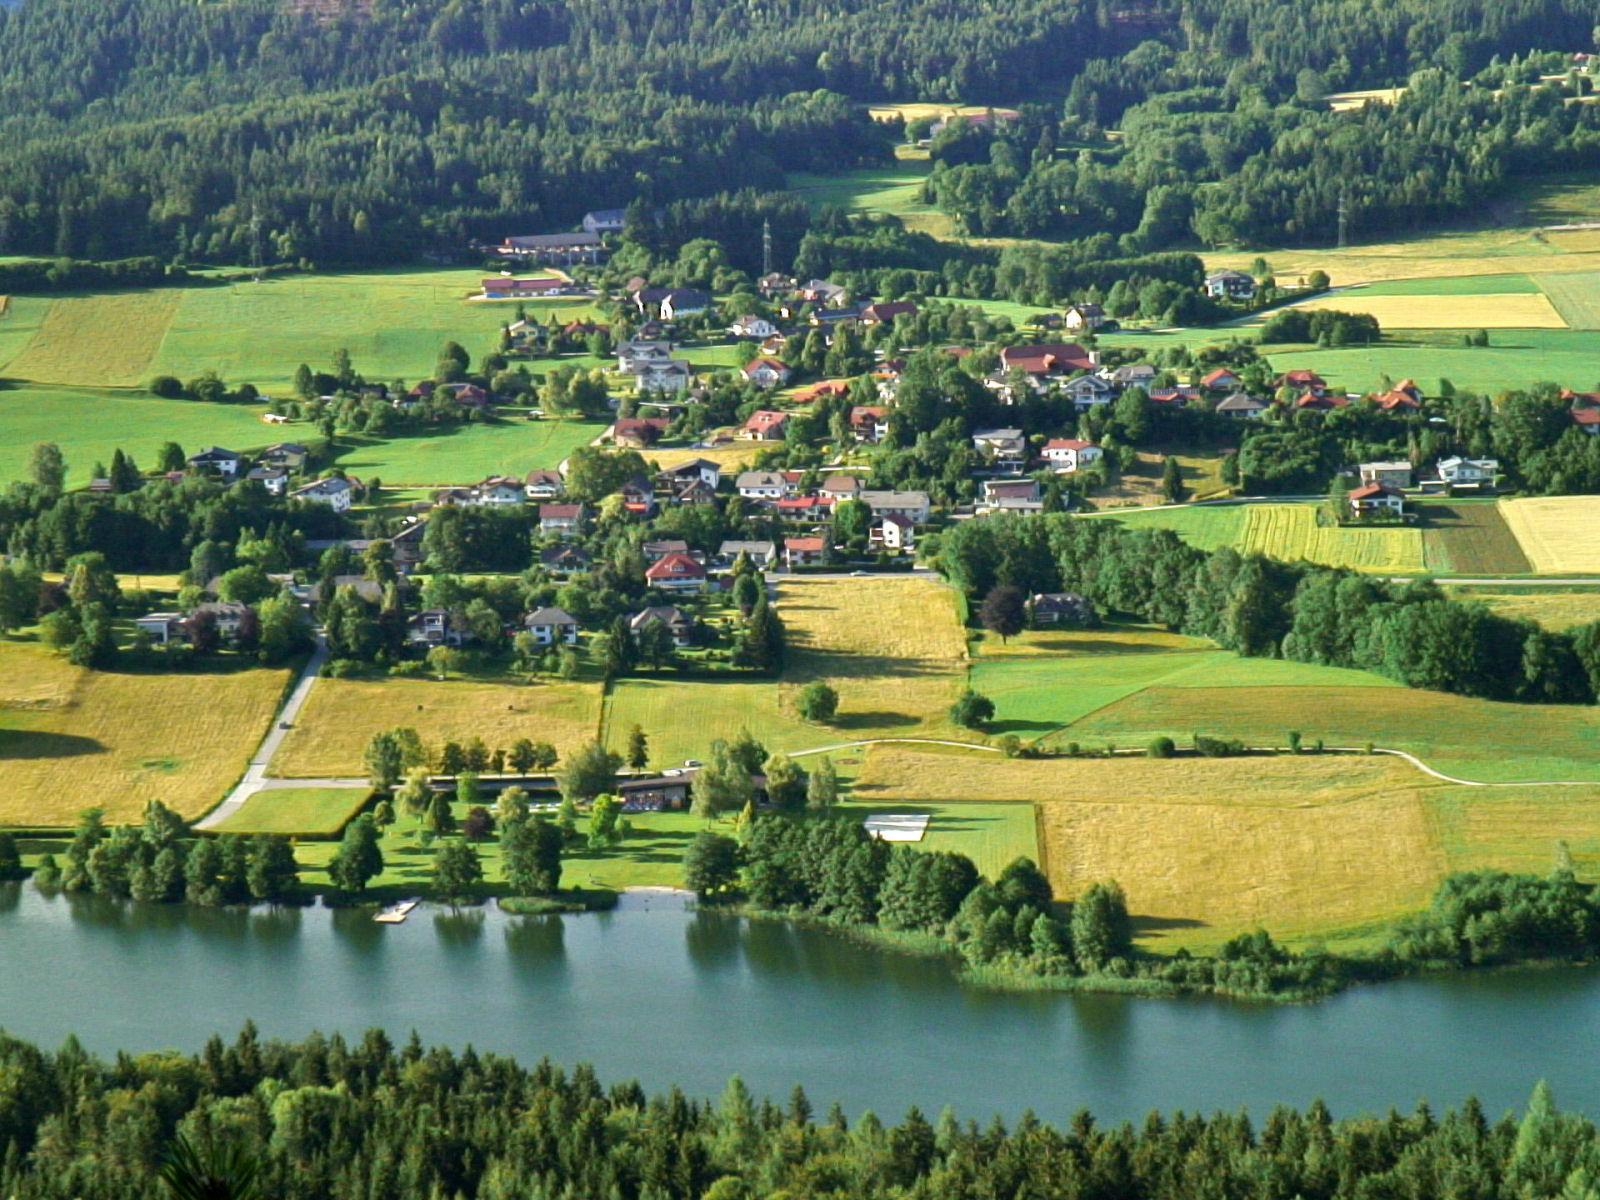 View from the Sattnitz ridge at the Rauschelesee lake, Carinthia, Austria